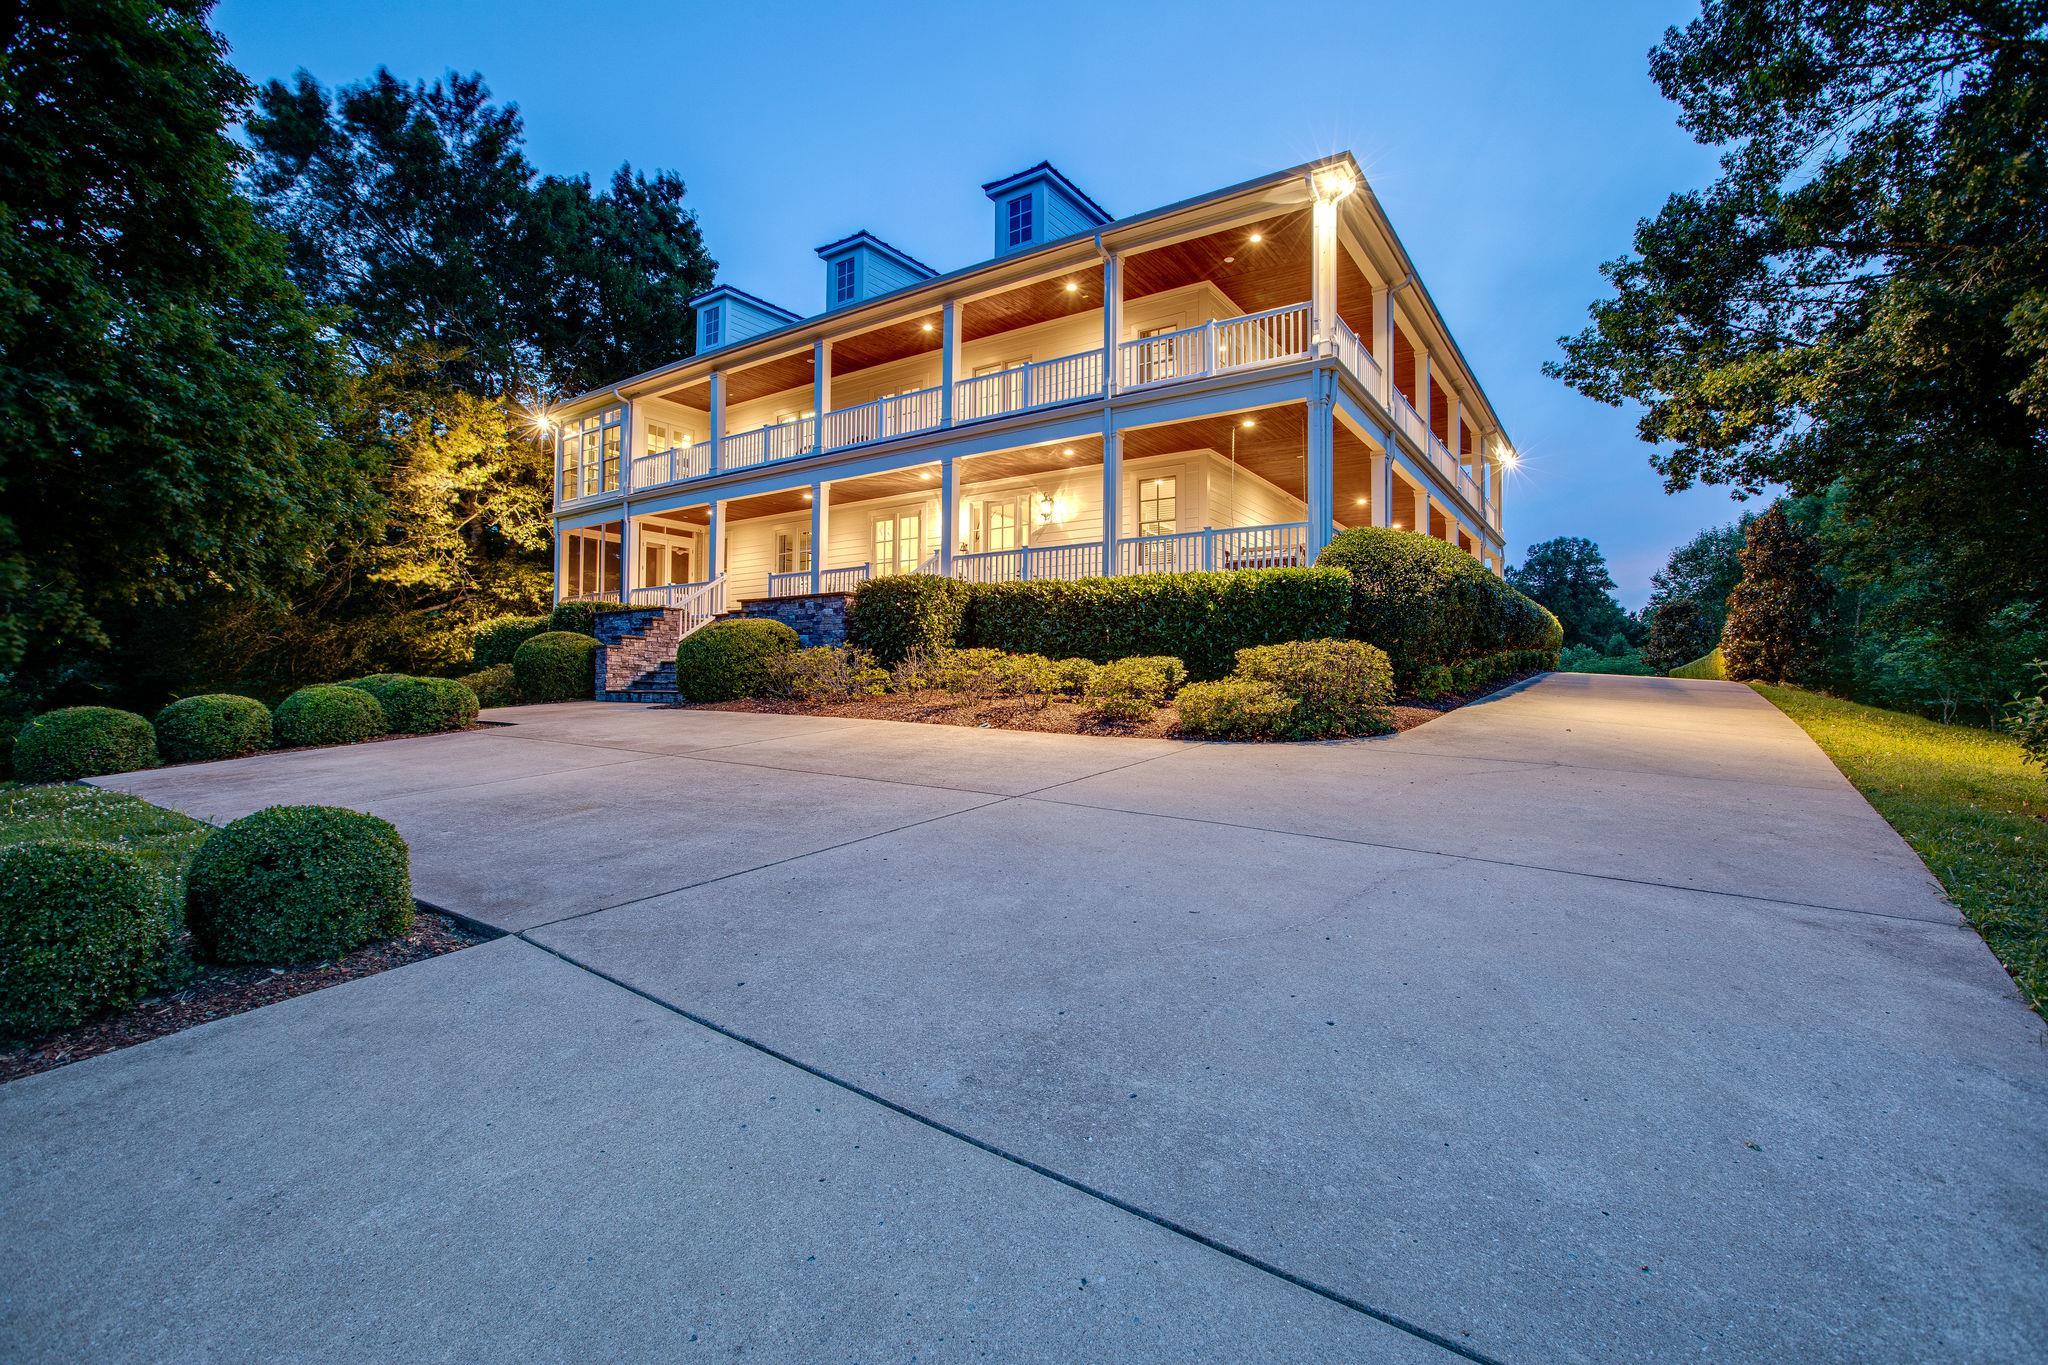 3801 Mistico Ln, Franklin, TN 37064 - Franklin, TN real estate listing